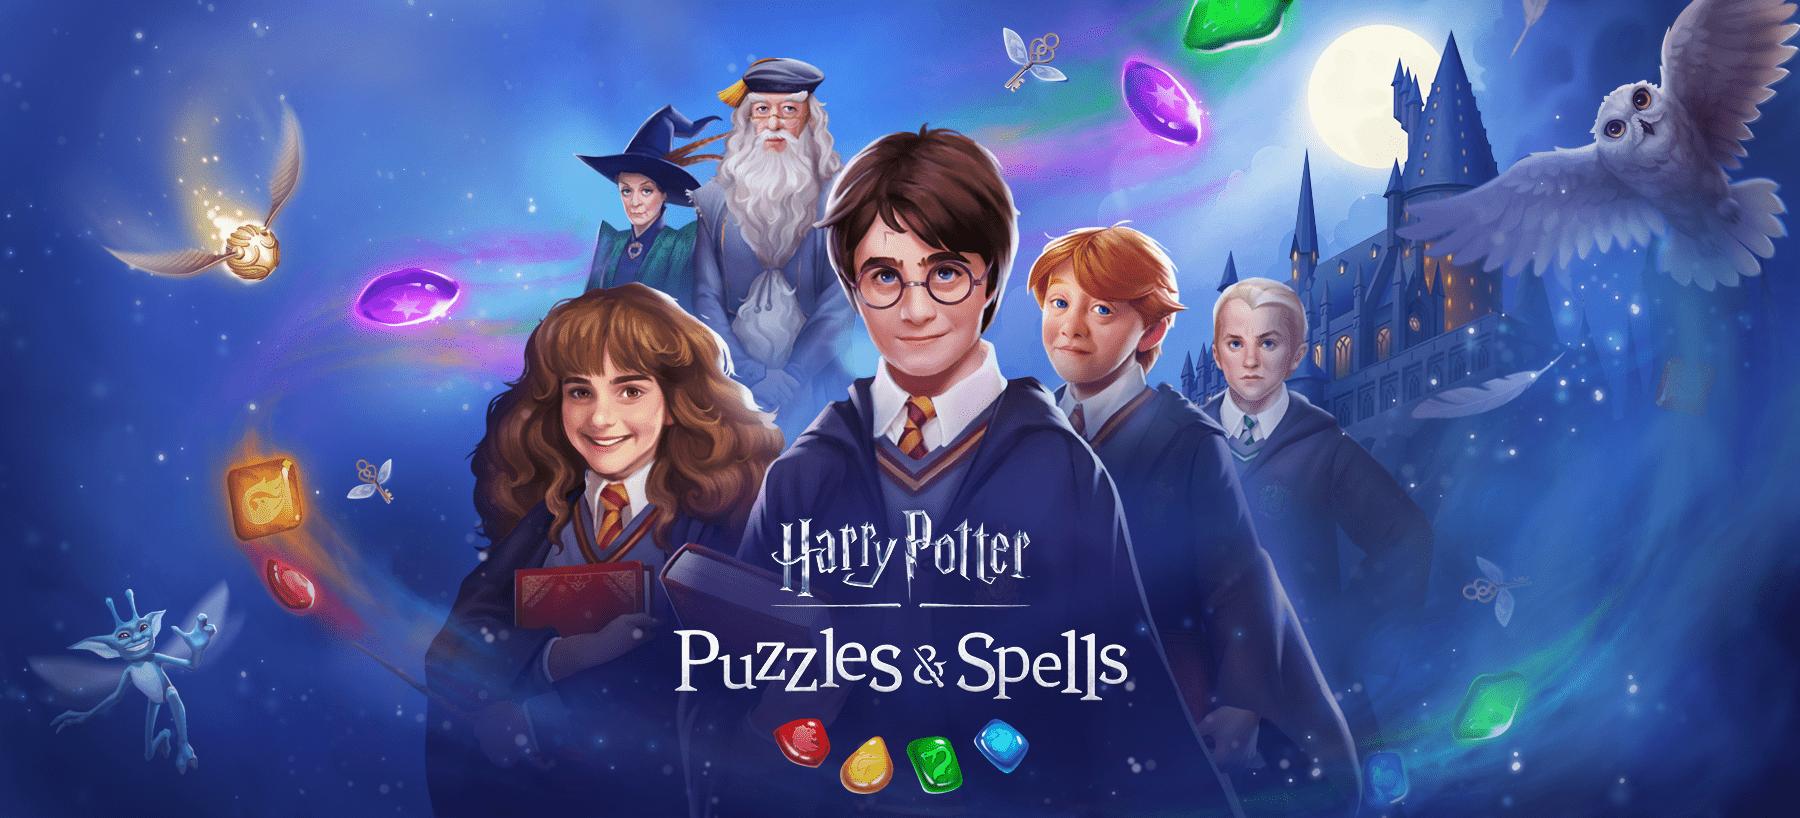 Capture d'écran Harry Potter: Puzzles and Spells Android